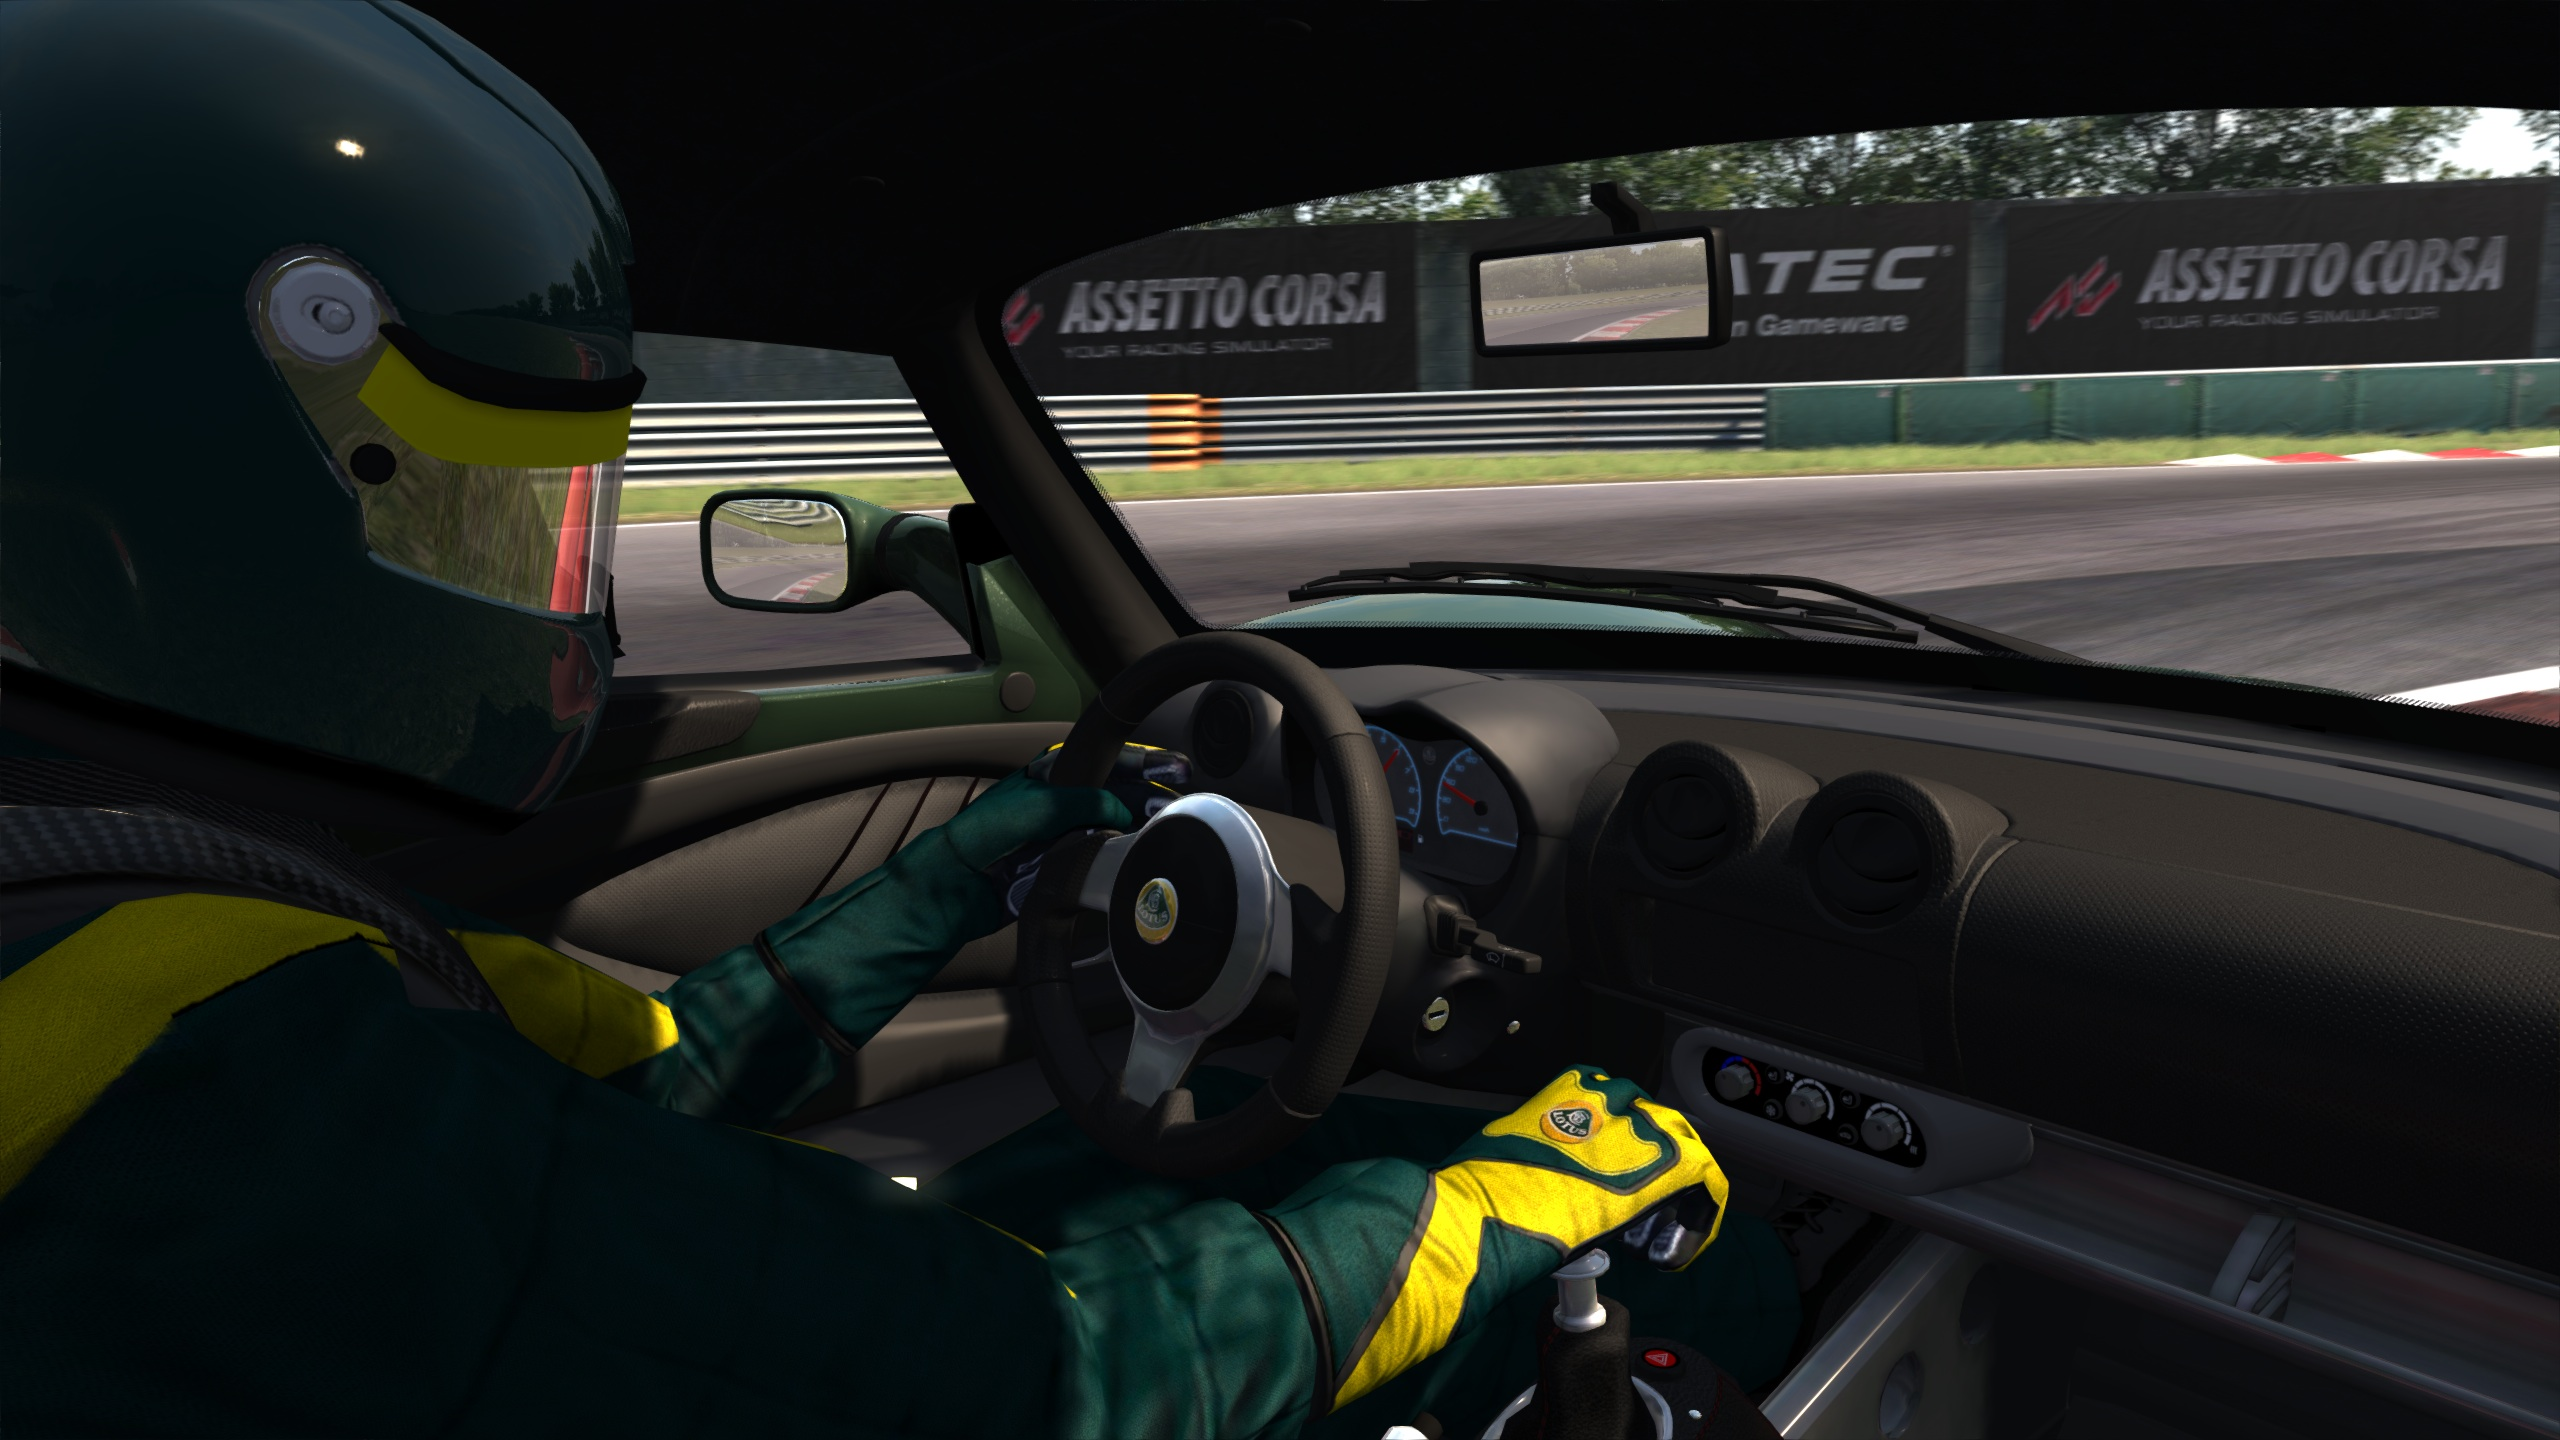 http://games.reveur.de/images/screenshots/assettocorsa-1361301650_5123d092ad1c1.jpg